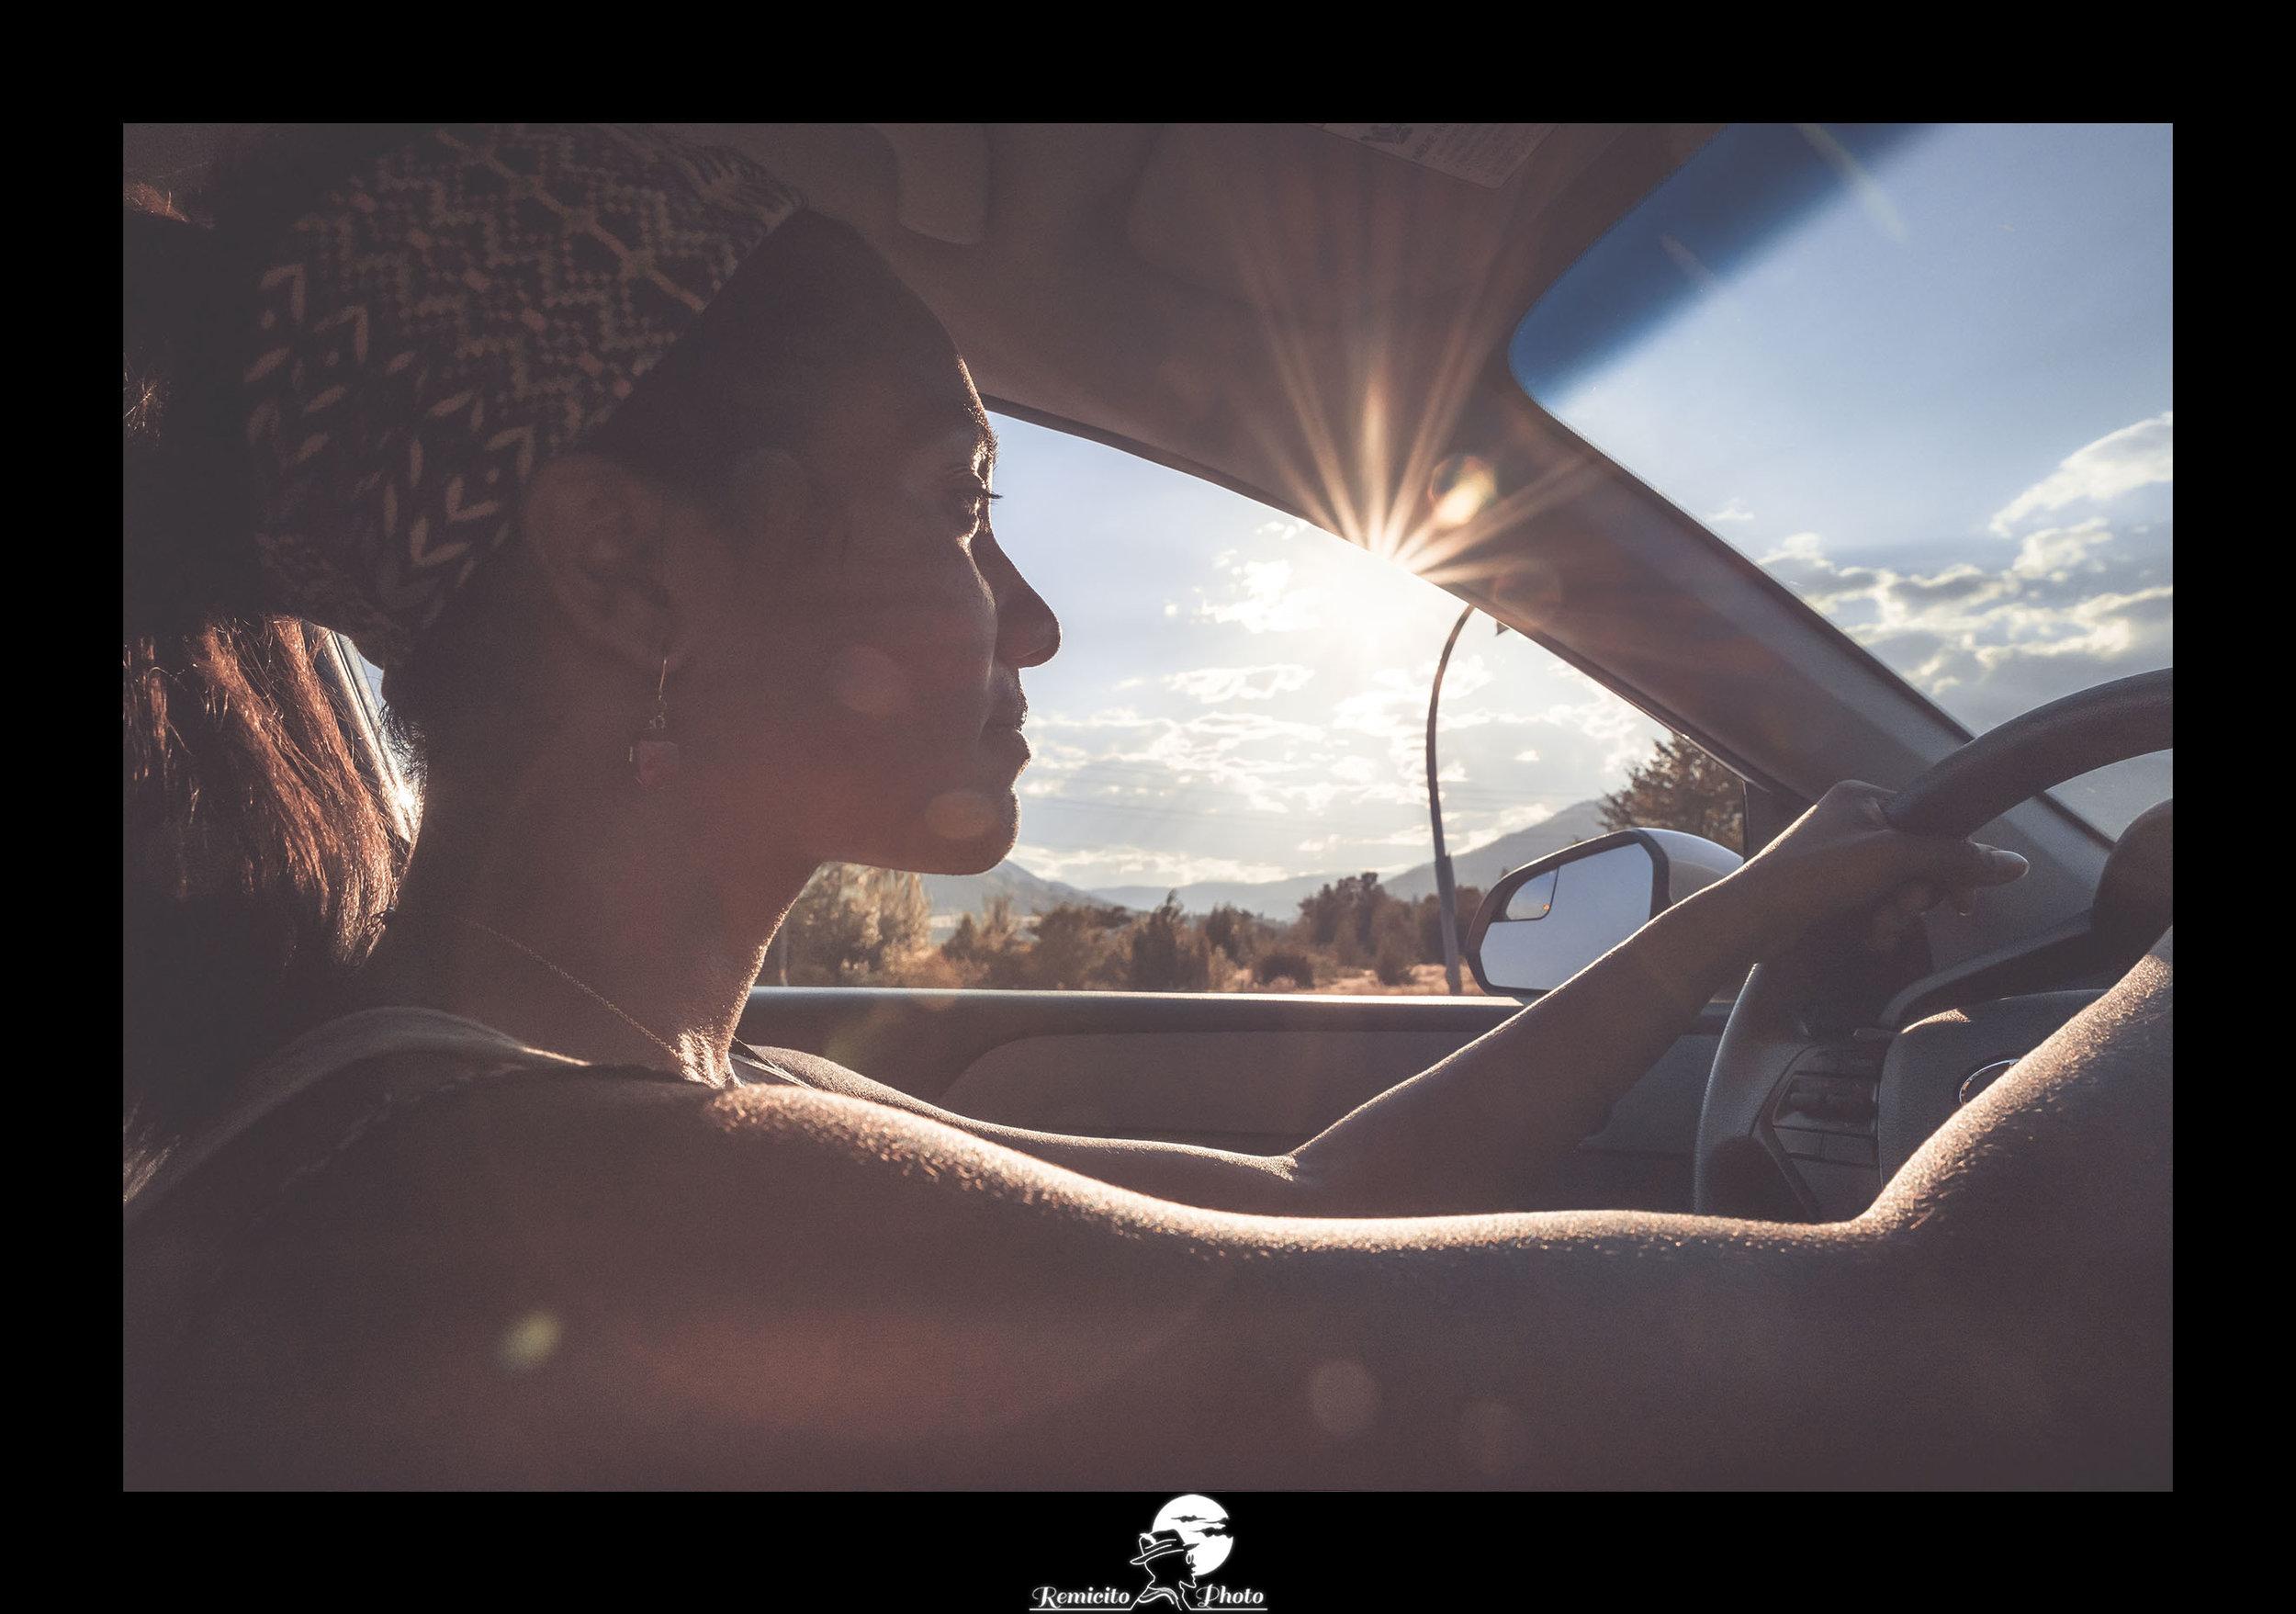 remicito photo, image du jour, photo du jour, photo of the day, bonnie and clyde, road trip canada, photo road trip, belle photo road trip, meilleur photographe français, best french photographer